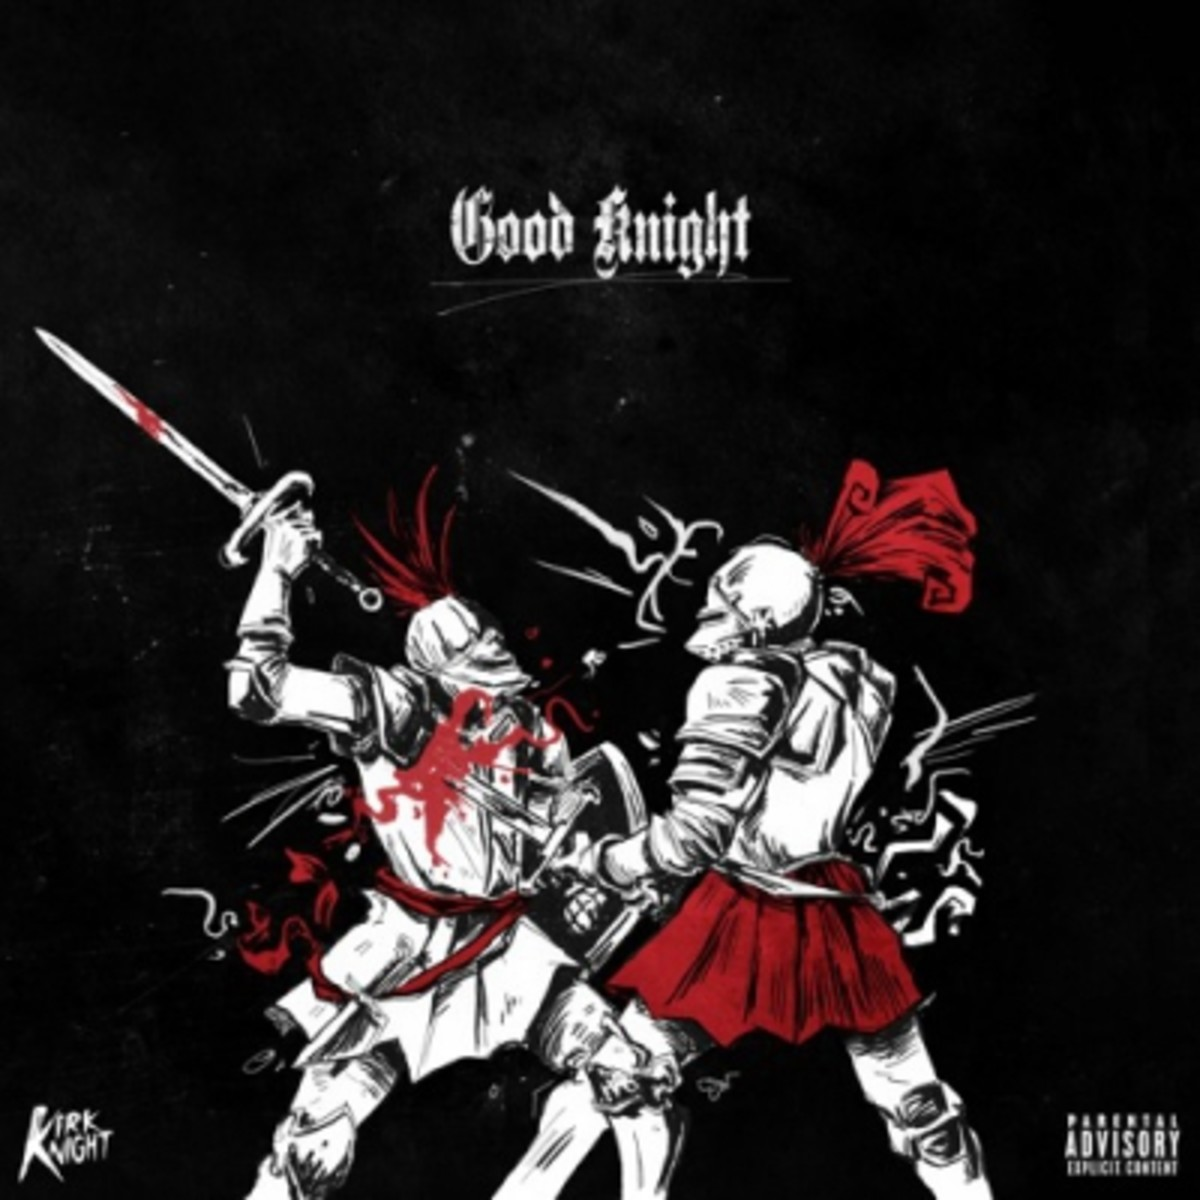 kirk-knight-good-knight.jpg